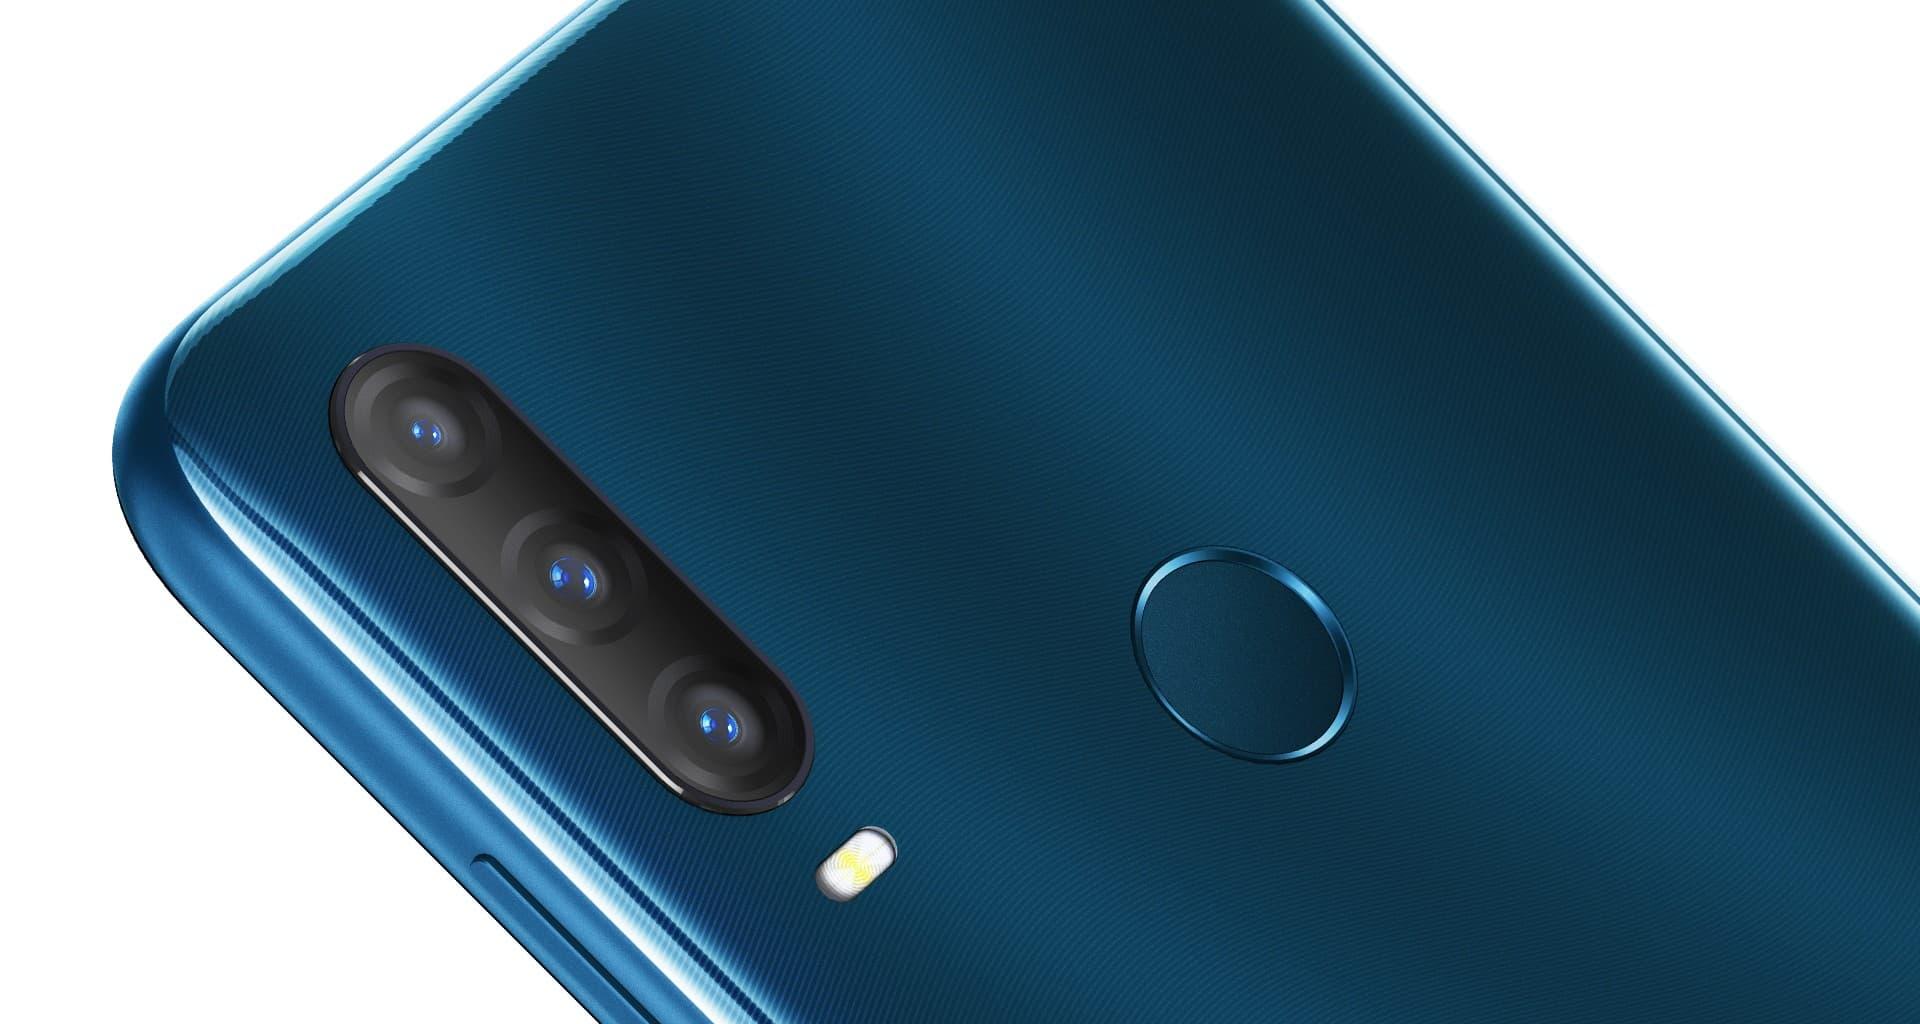 alcatel 3L (2020) buy smartphone, compare prices in stores. alcatel 3L  (2020) - opinions, photos, video review, description and characteristics |  Vedroid.com